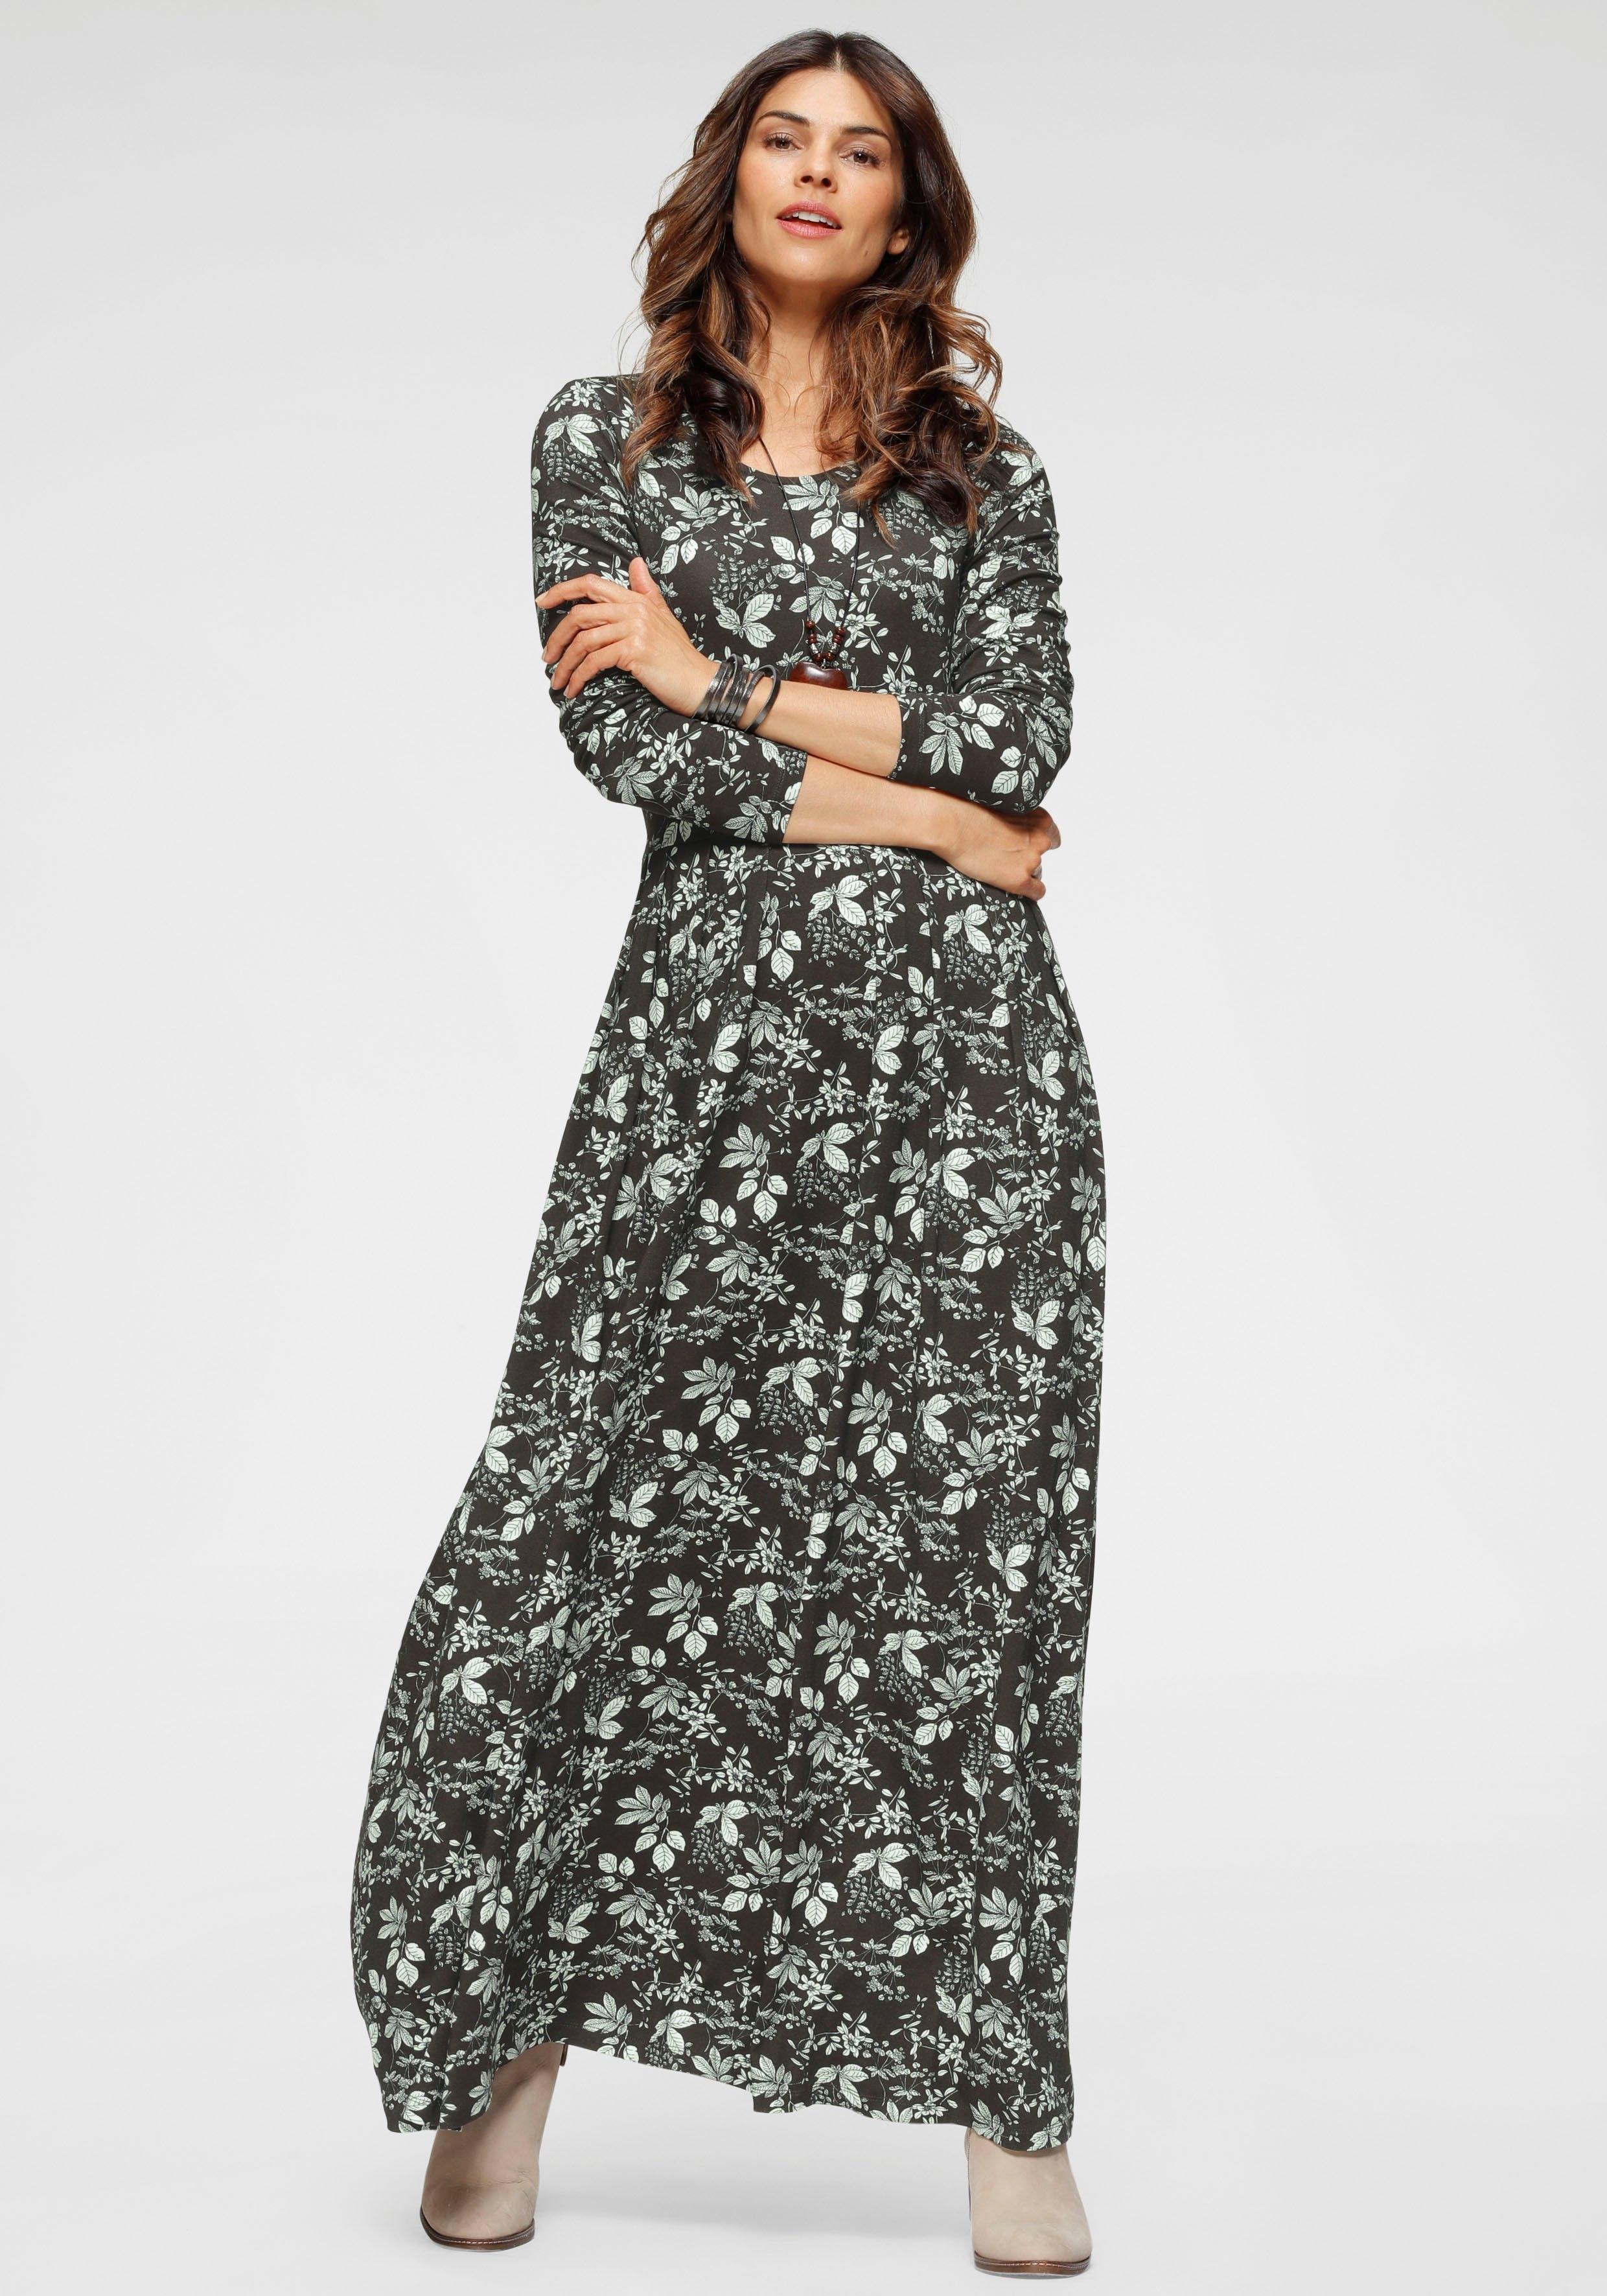 Boysen's maxi-jurk in uitlopend model - in 2 verschillende dessins nu online bestellen